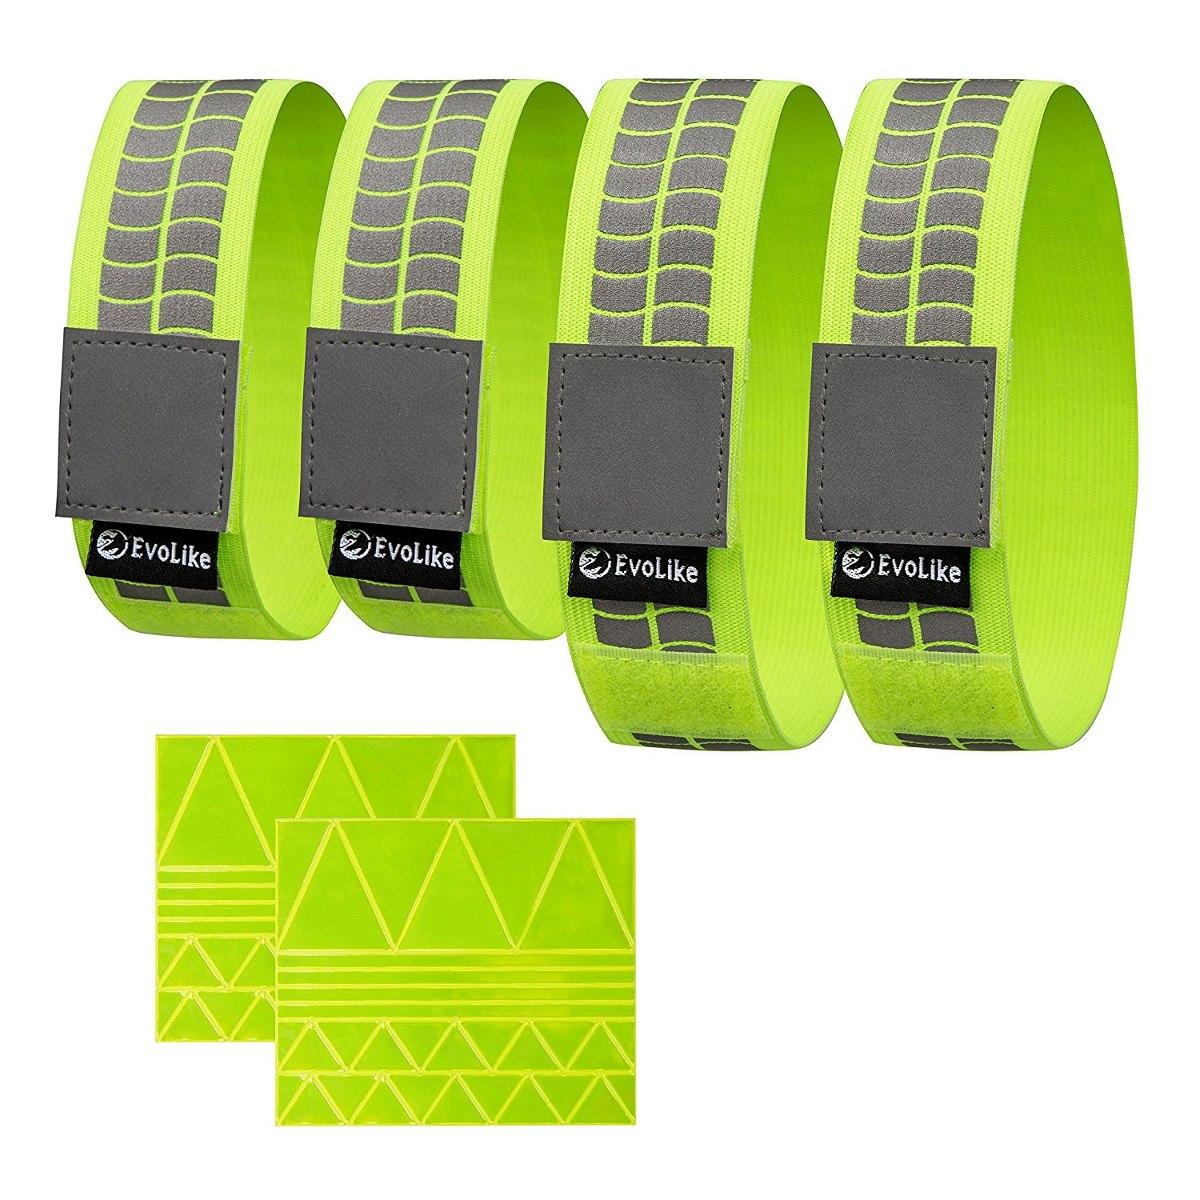 5d2d0a7540a6 Evolike Premium Pulseras Reflectantes Brazaletes Para Cin ...